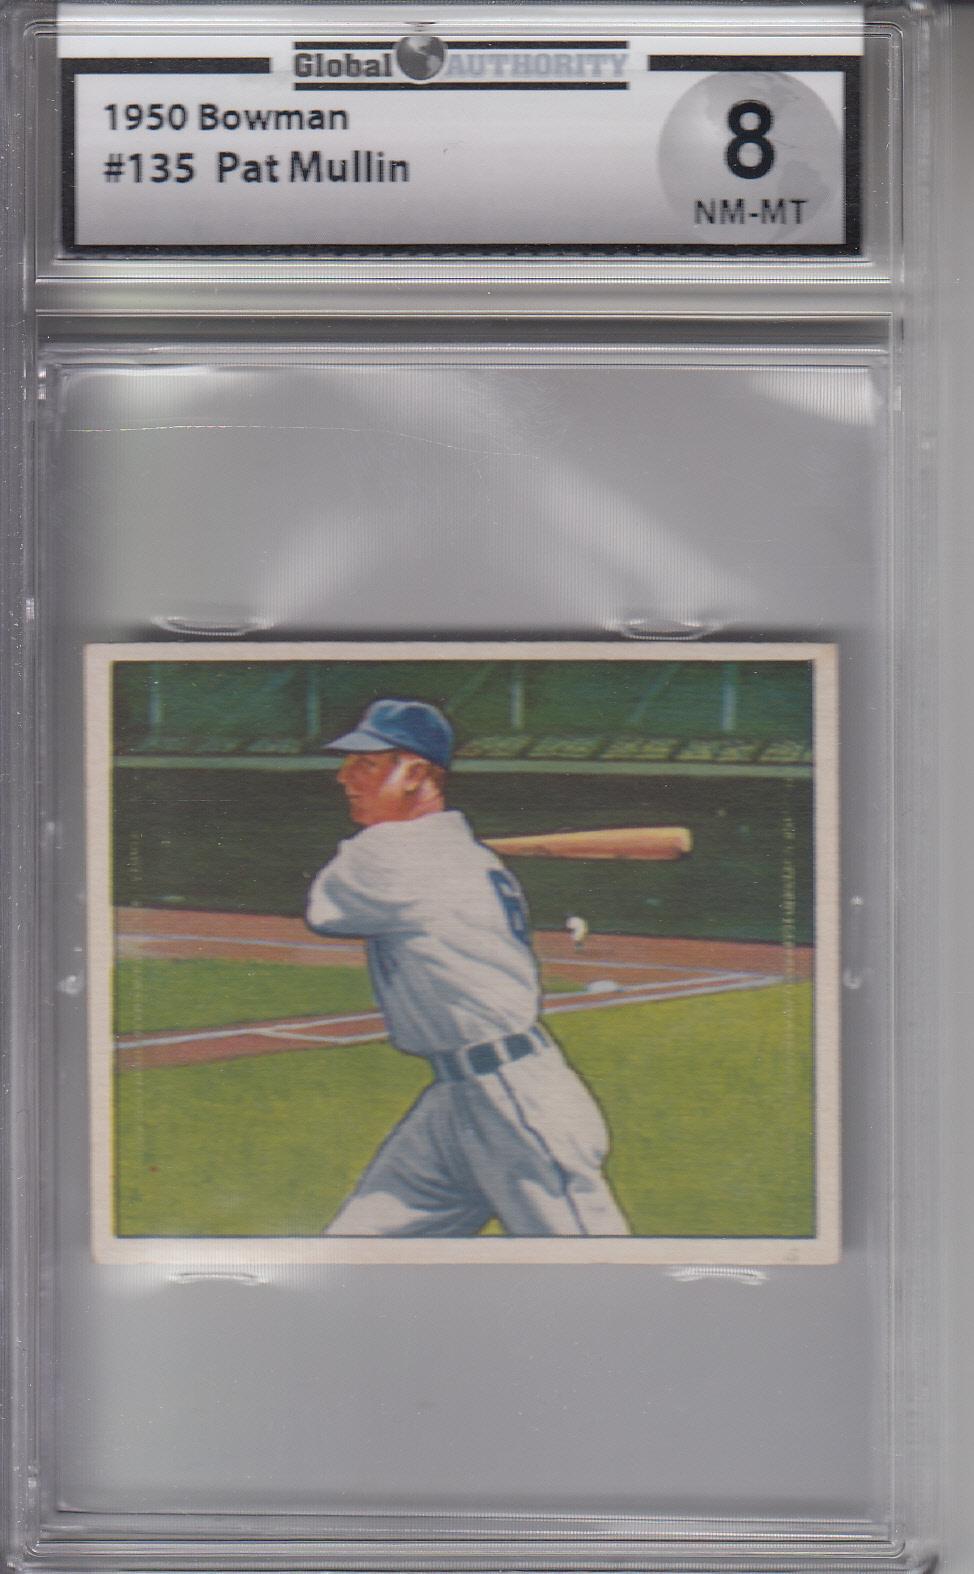 1950 Bowman #135 Pat Mullin TIGERS GAI 8 NM-MT Z19050